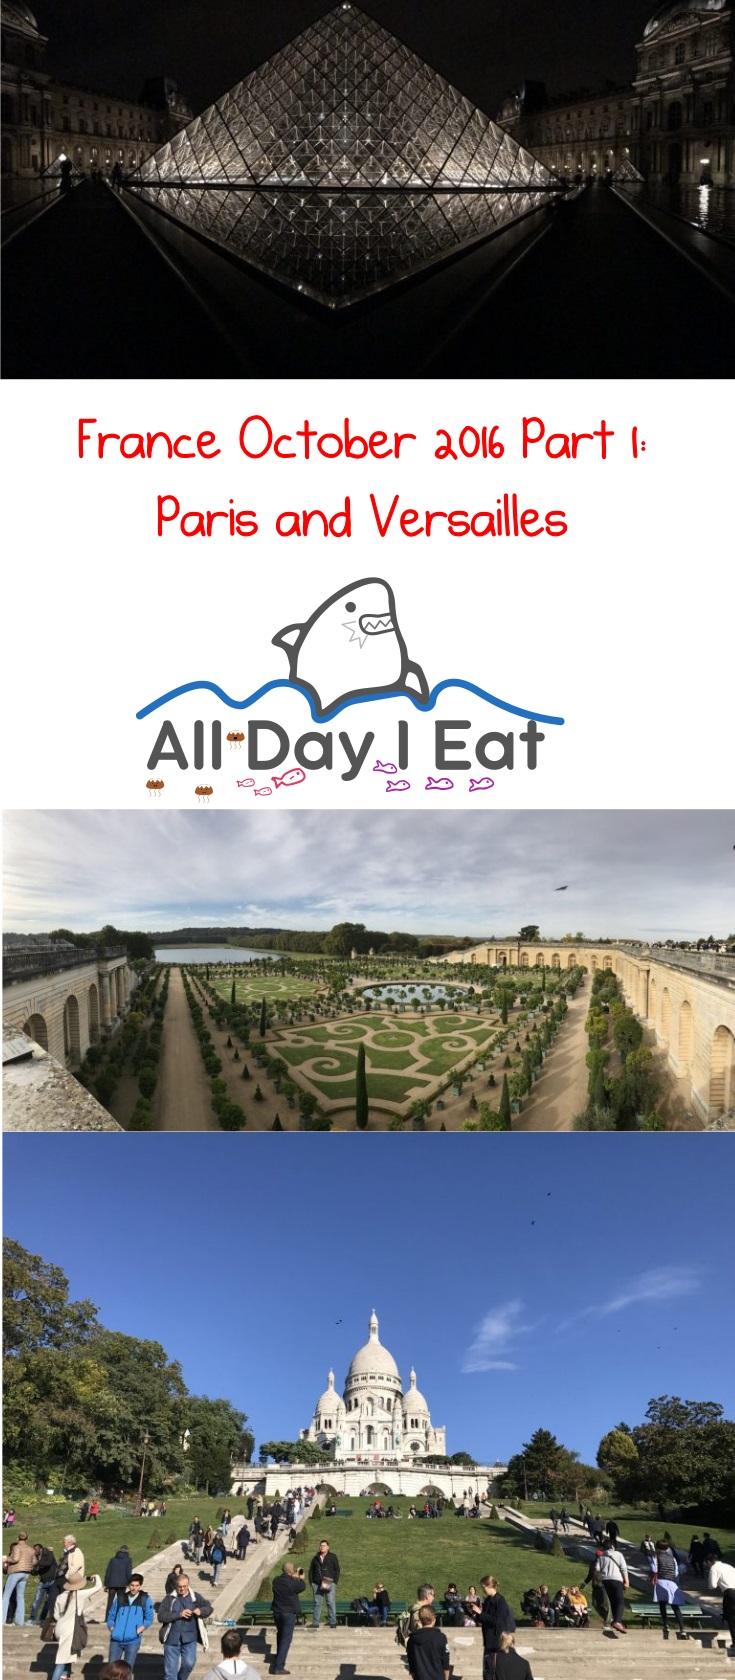 France October 2016 Part 1: Paris and Versailles Ideas for your next visit! | www.alldayieat.com